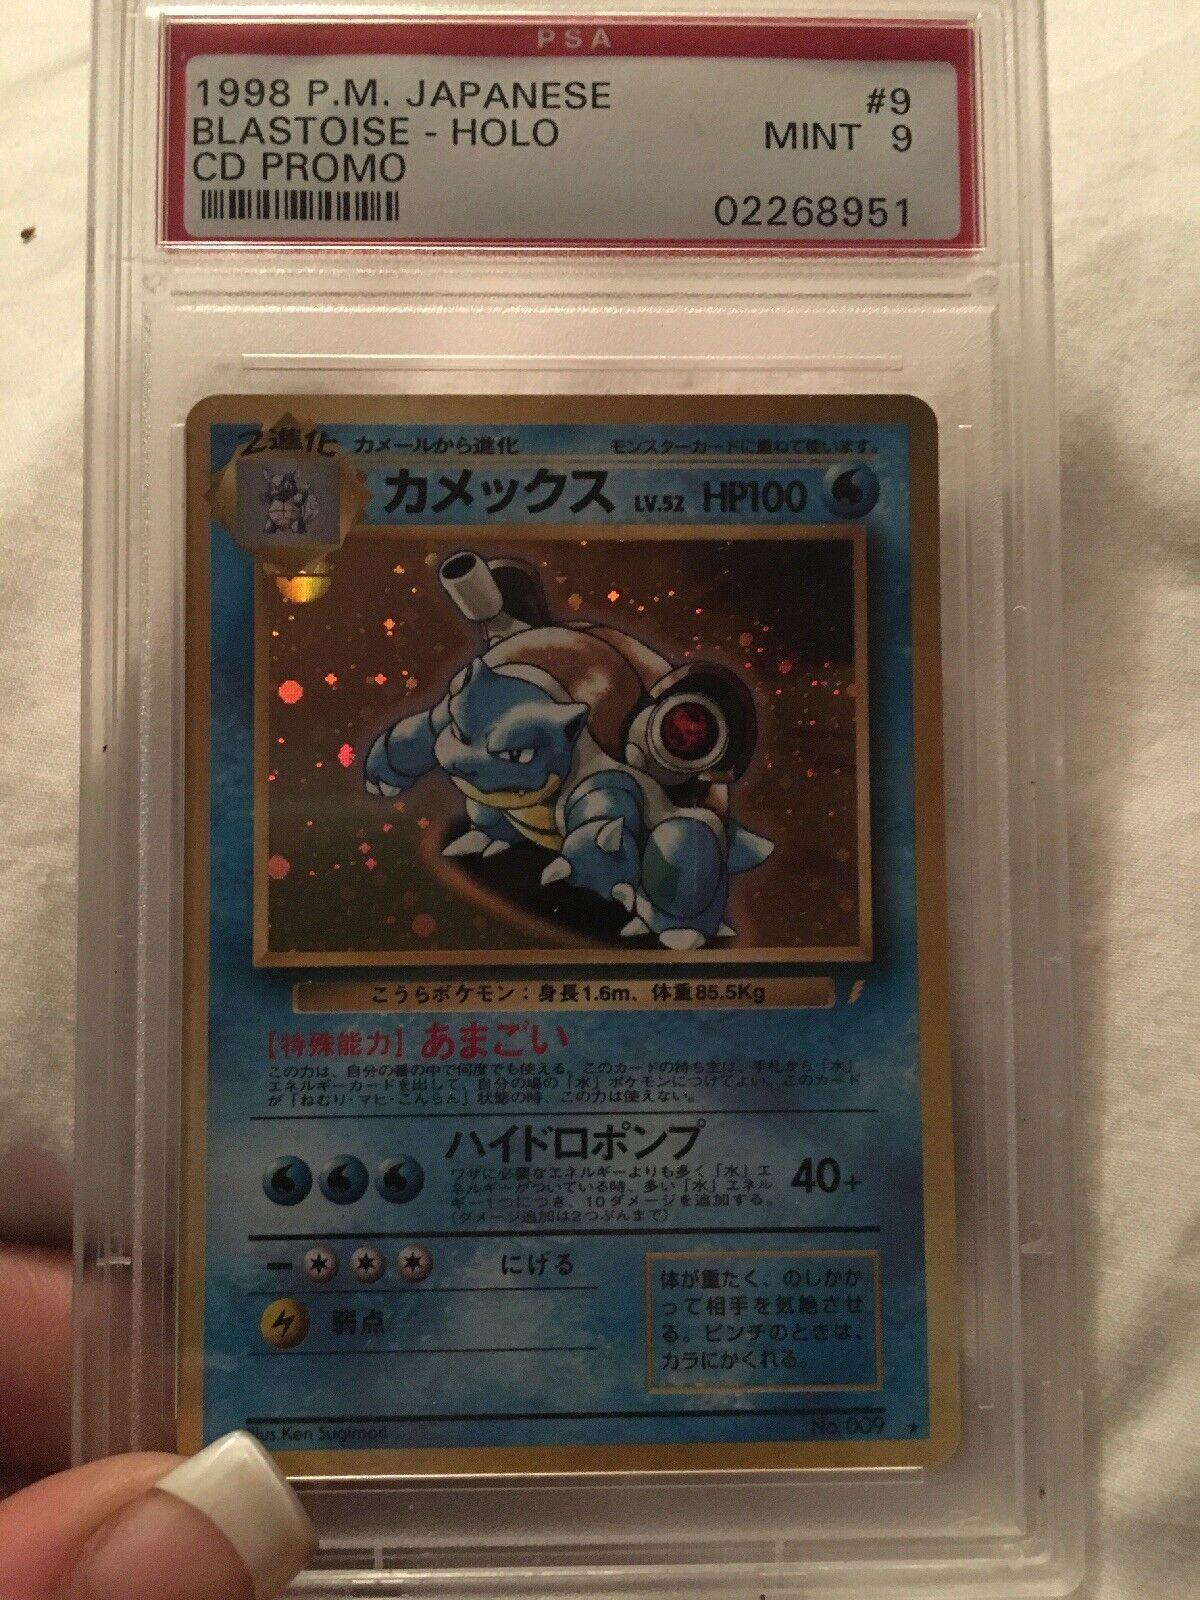 1998 P.M. Japanese Blastoise Holo CD Promo PSA Mint 9 Pokemon Card